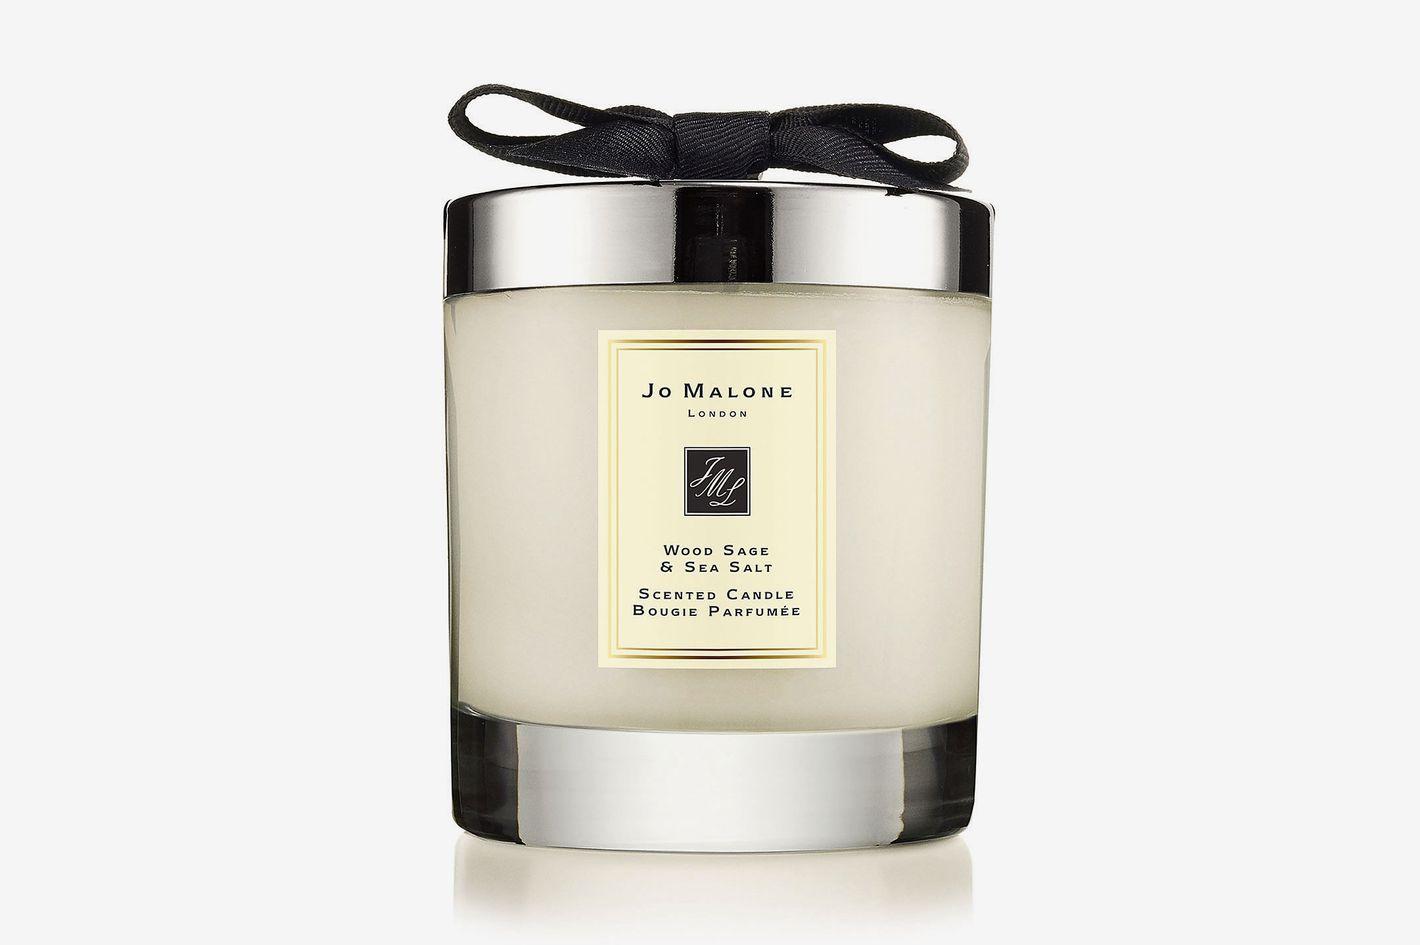 Jo Malone Wood Sage & Sea Salt Candle